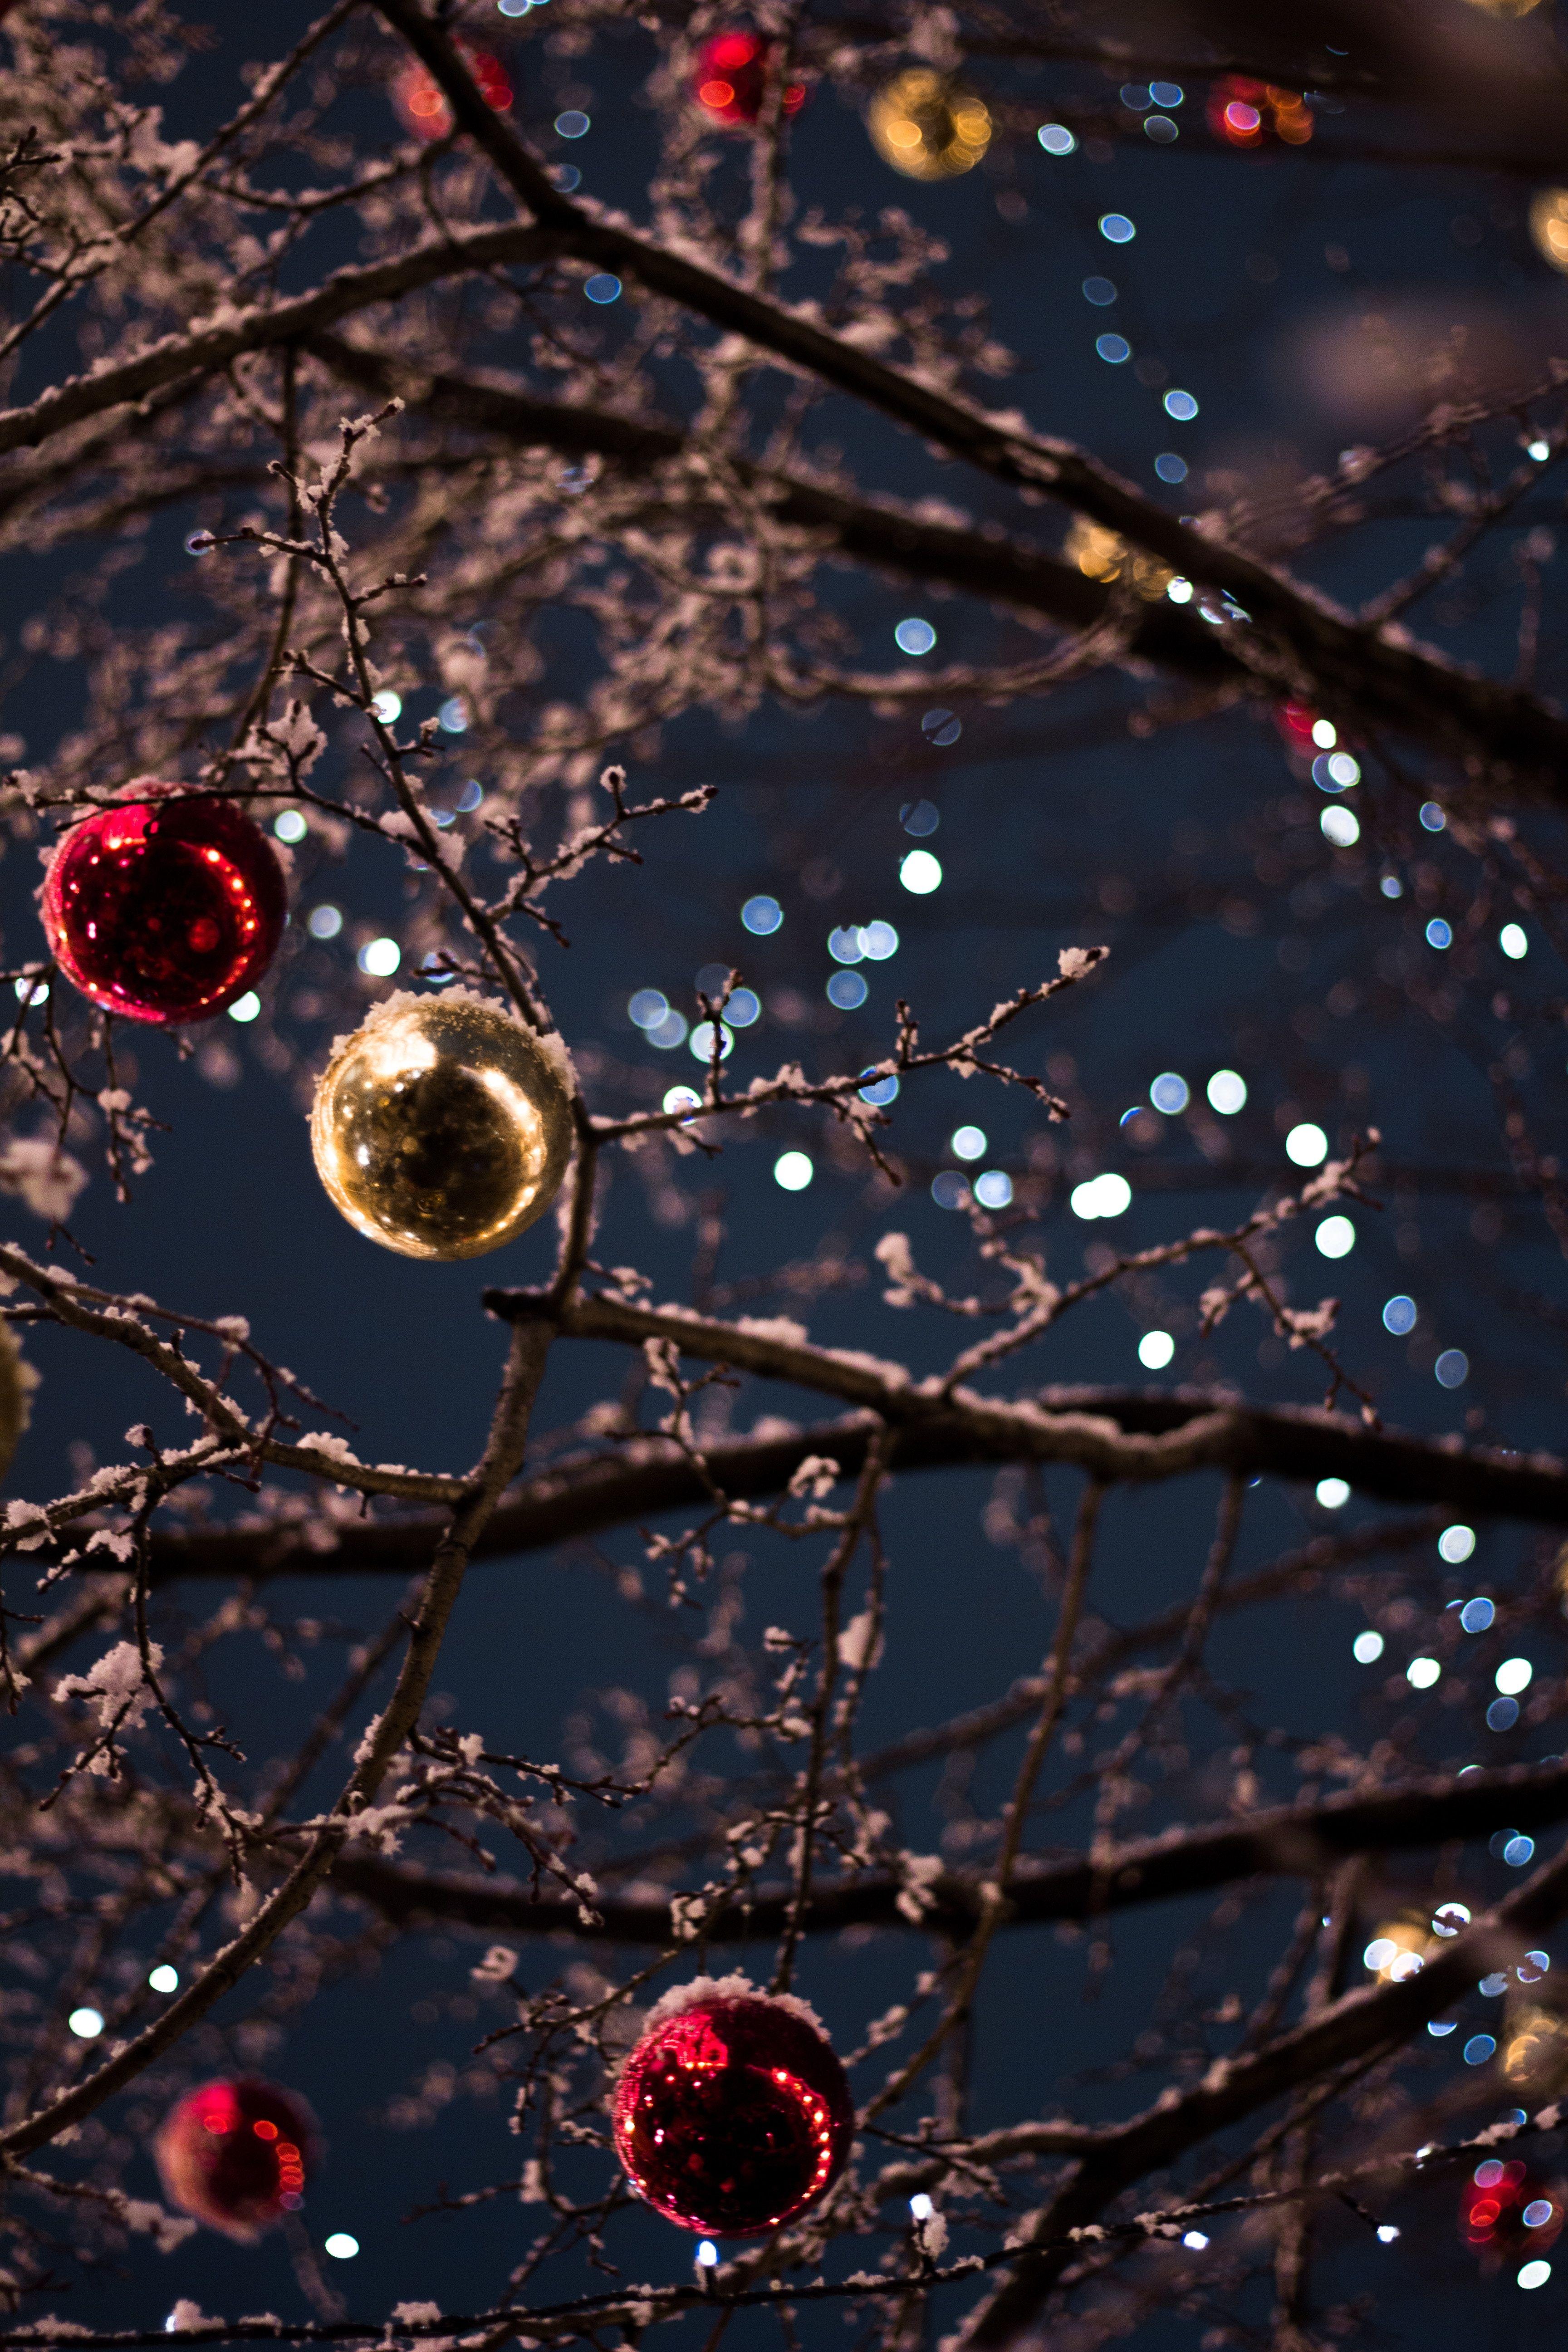 Happy New Year Backdrop Chiristmas Backdrop Christmas Tree Backdrop Santa Cluas Backdr Wallpaper Iphone Christmas Christmas Phone Wallpaper Christmas Wallpaper